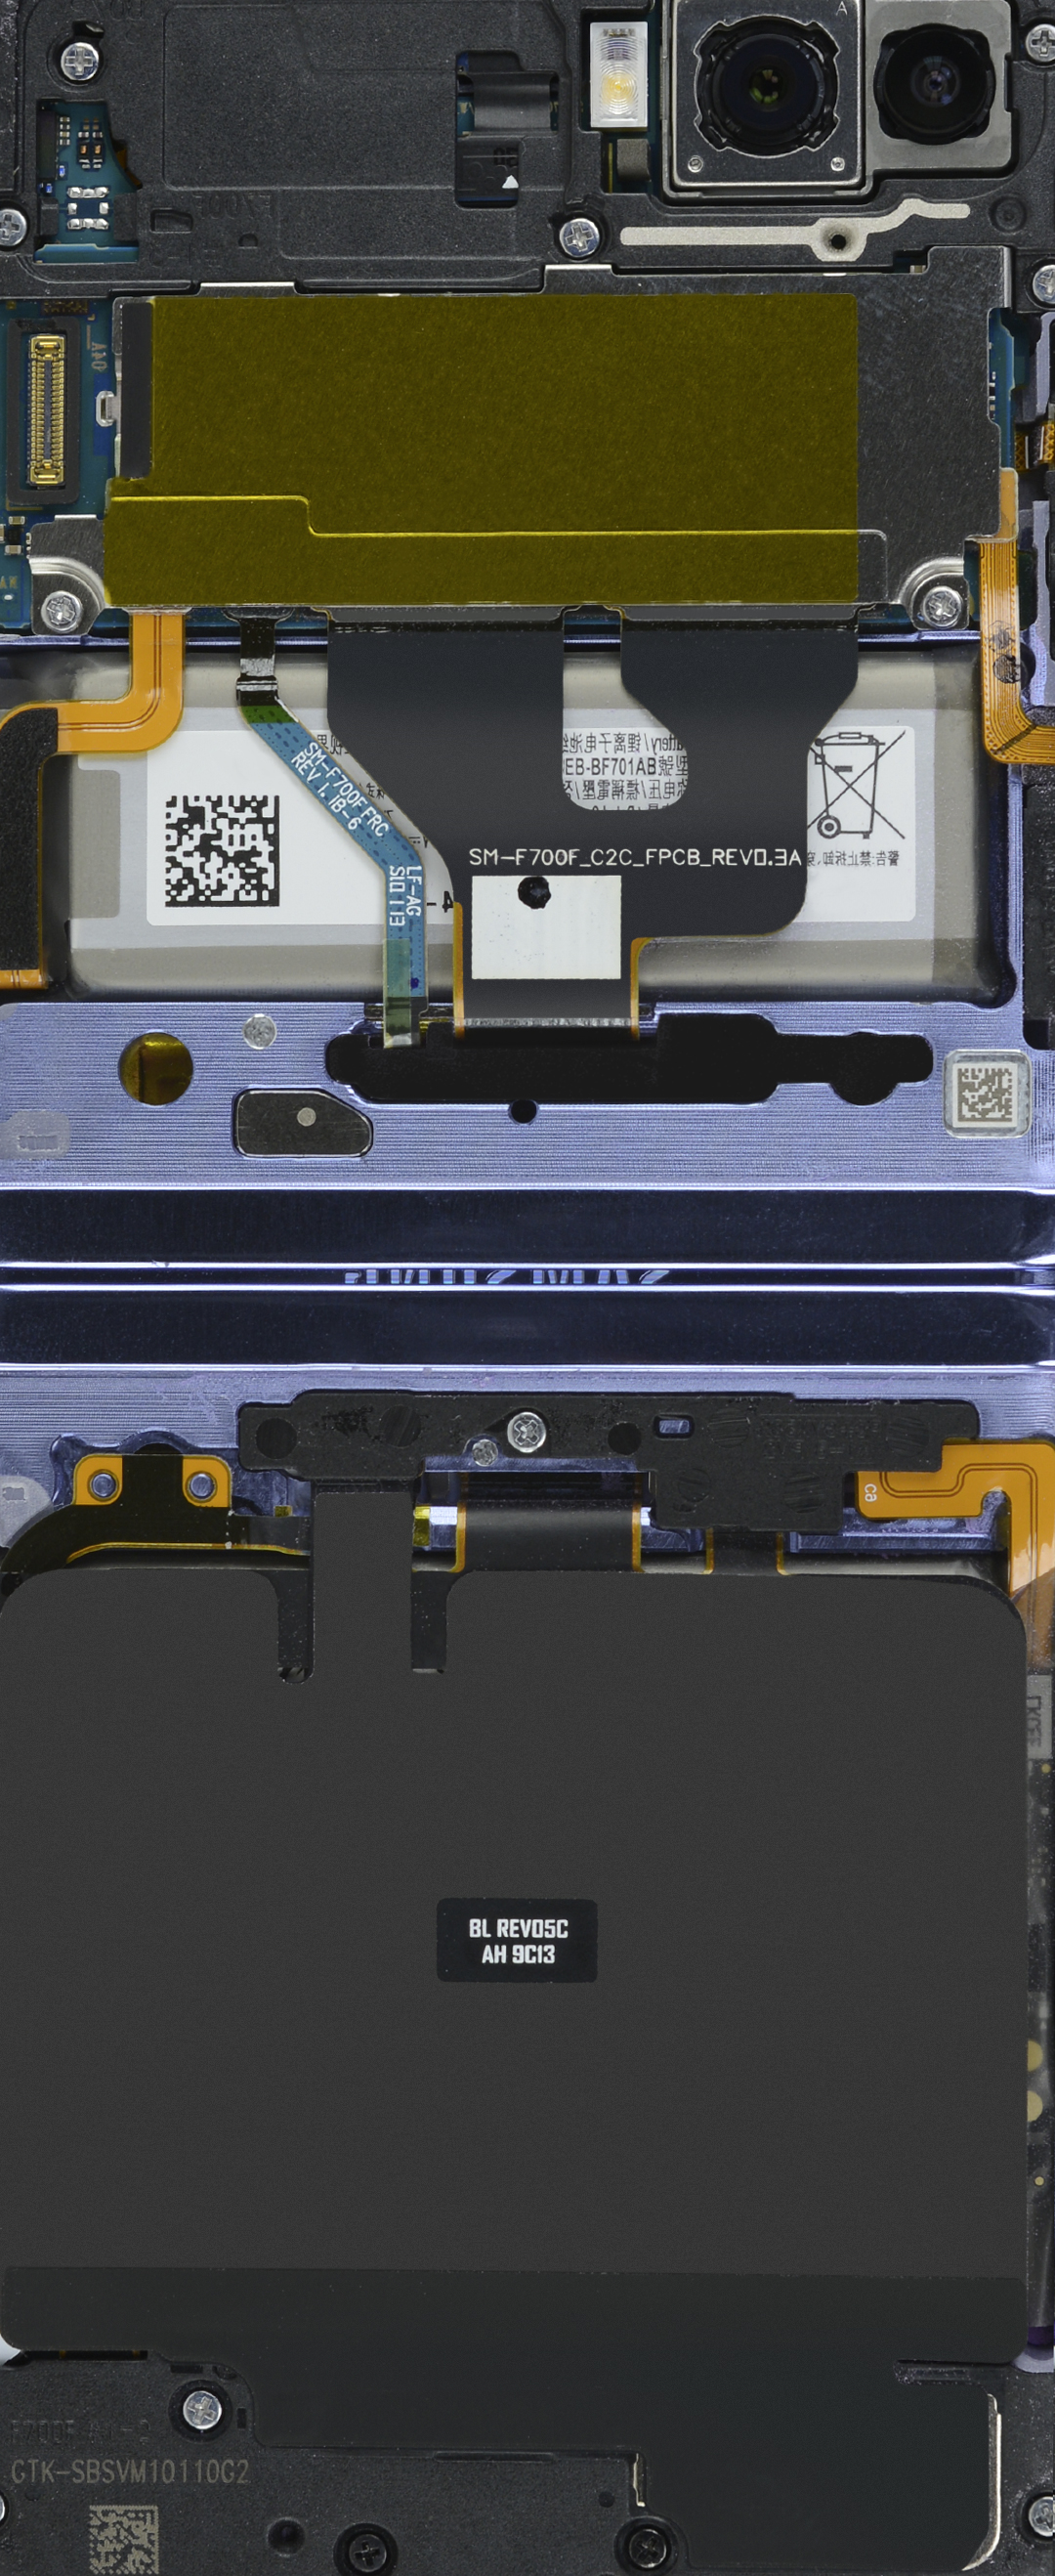 Galaxy Z Flip Messo A Nudo In Due Sfondi Download Hdblog It